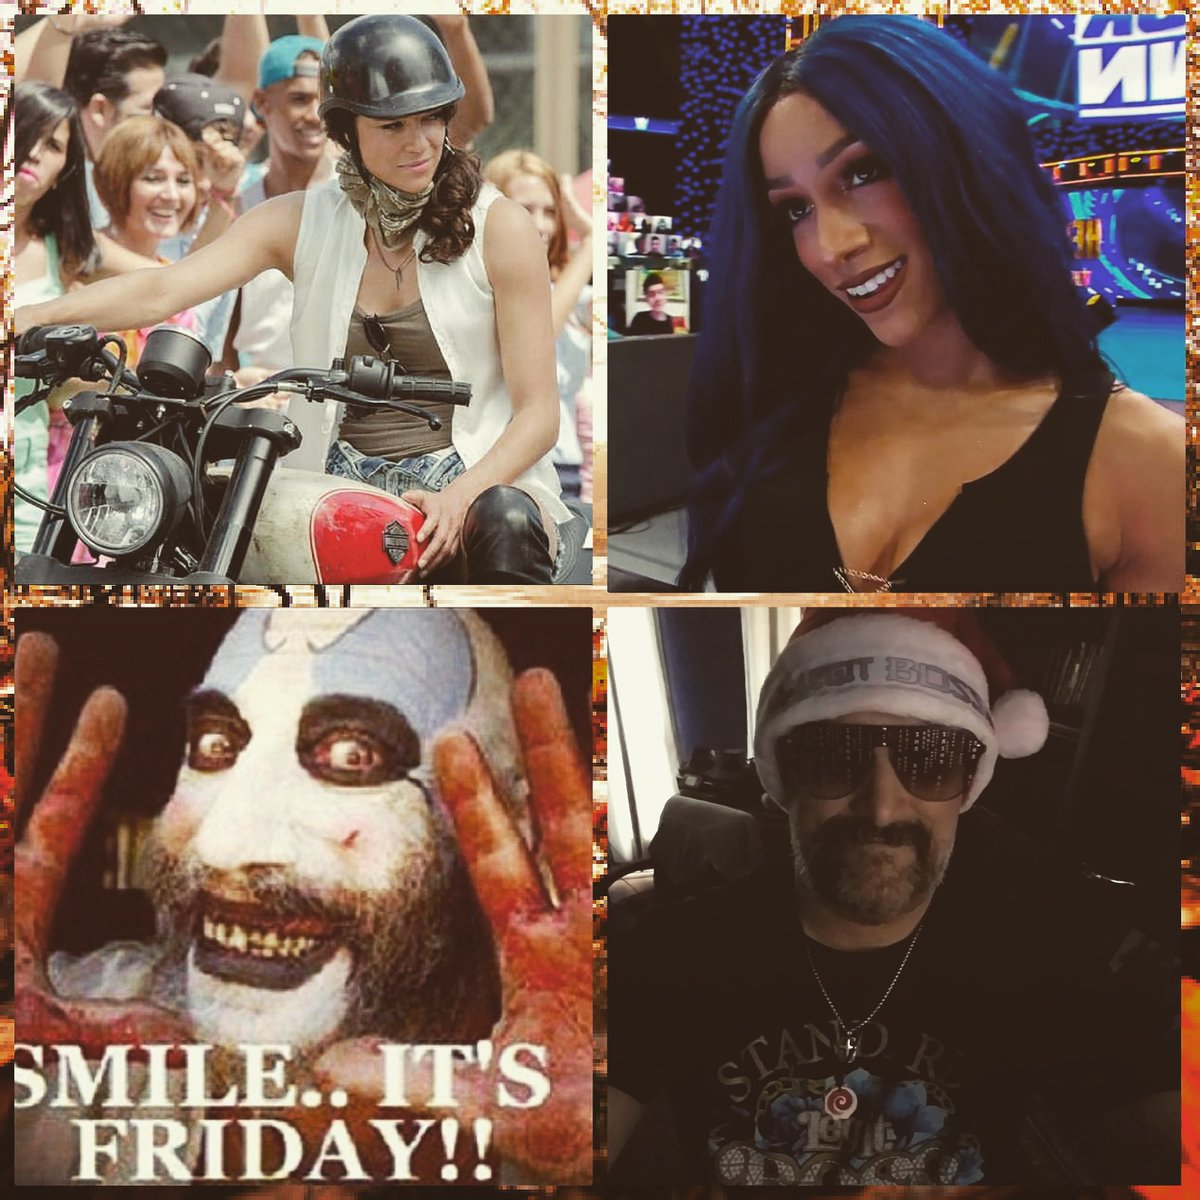 #GoodEvening #FridayNightBanks #Smackdown #TGIF Shhhhhhhhhhhh #ItsBossTime #LetsGo y'all xoxo #Happy #Selfie #WrestlerLover #TeamHorror #horrorfamily #horrorlover #SashaBanks #SashaKrew #LegitBoss #MichelleRodrguez #mrodfamily #mrodlover #Horror4Life #Loyal 😊😍🤡😱😈💀👹💙💜❤